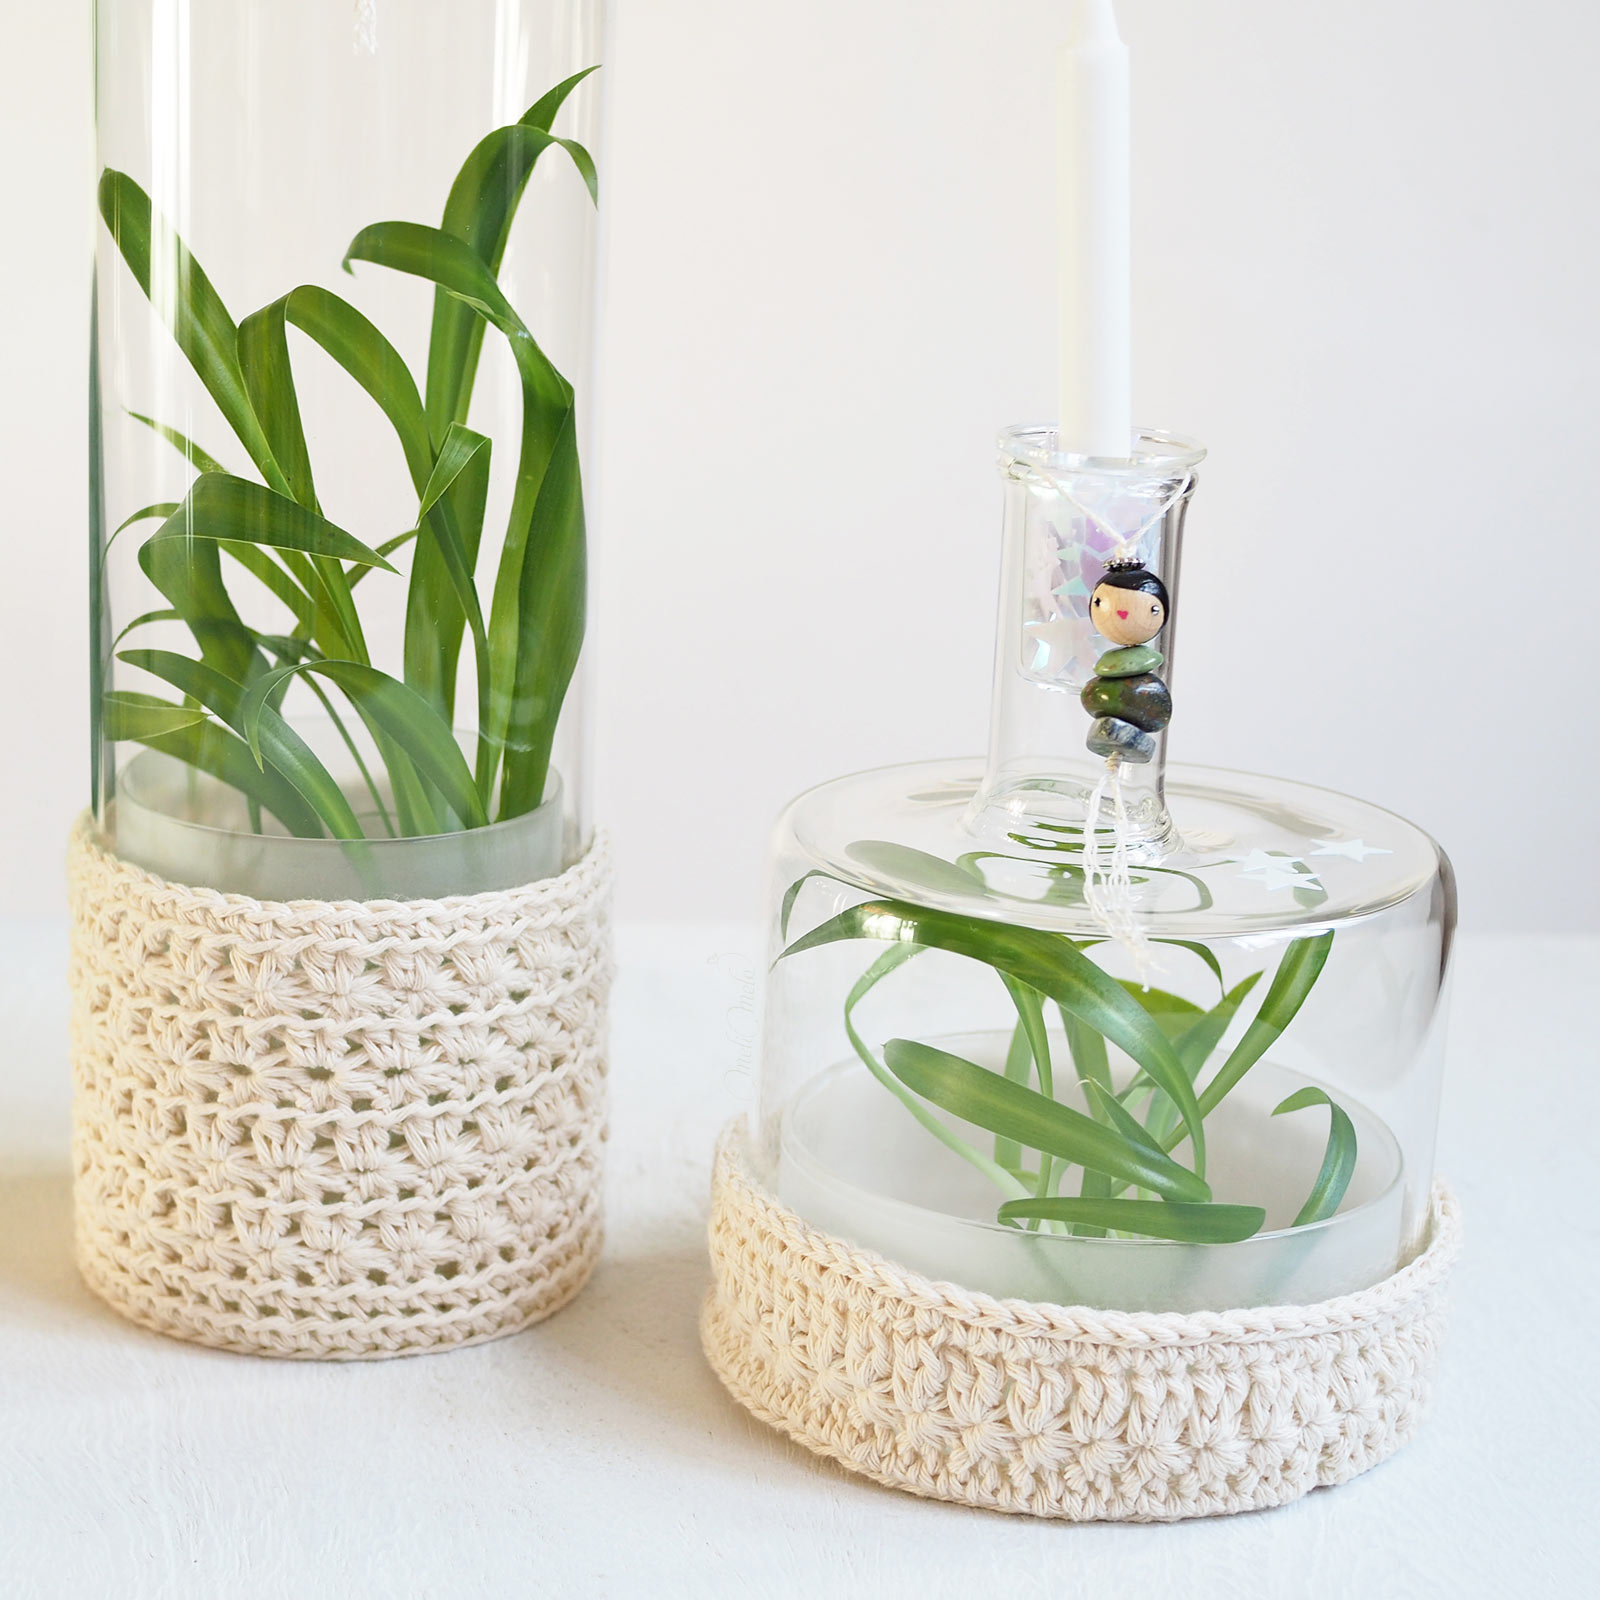 mini-serre plantules chlorophytum chevelu crochet vase déco Ichendorf lespoisplumes laboutiquedemelimelo